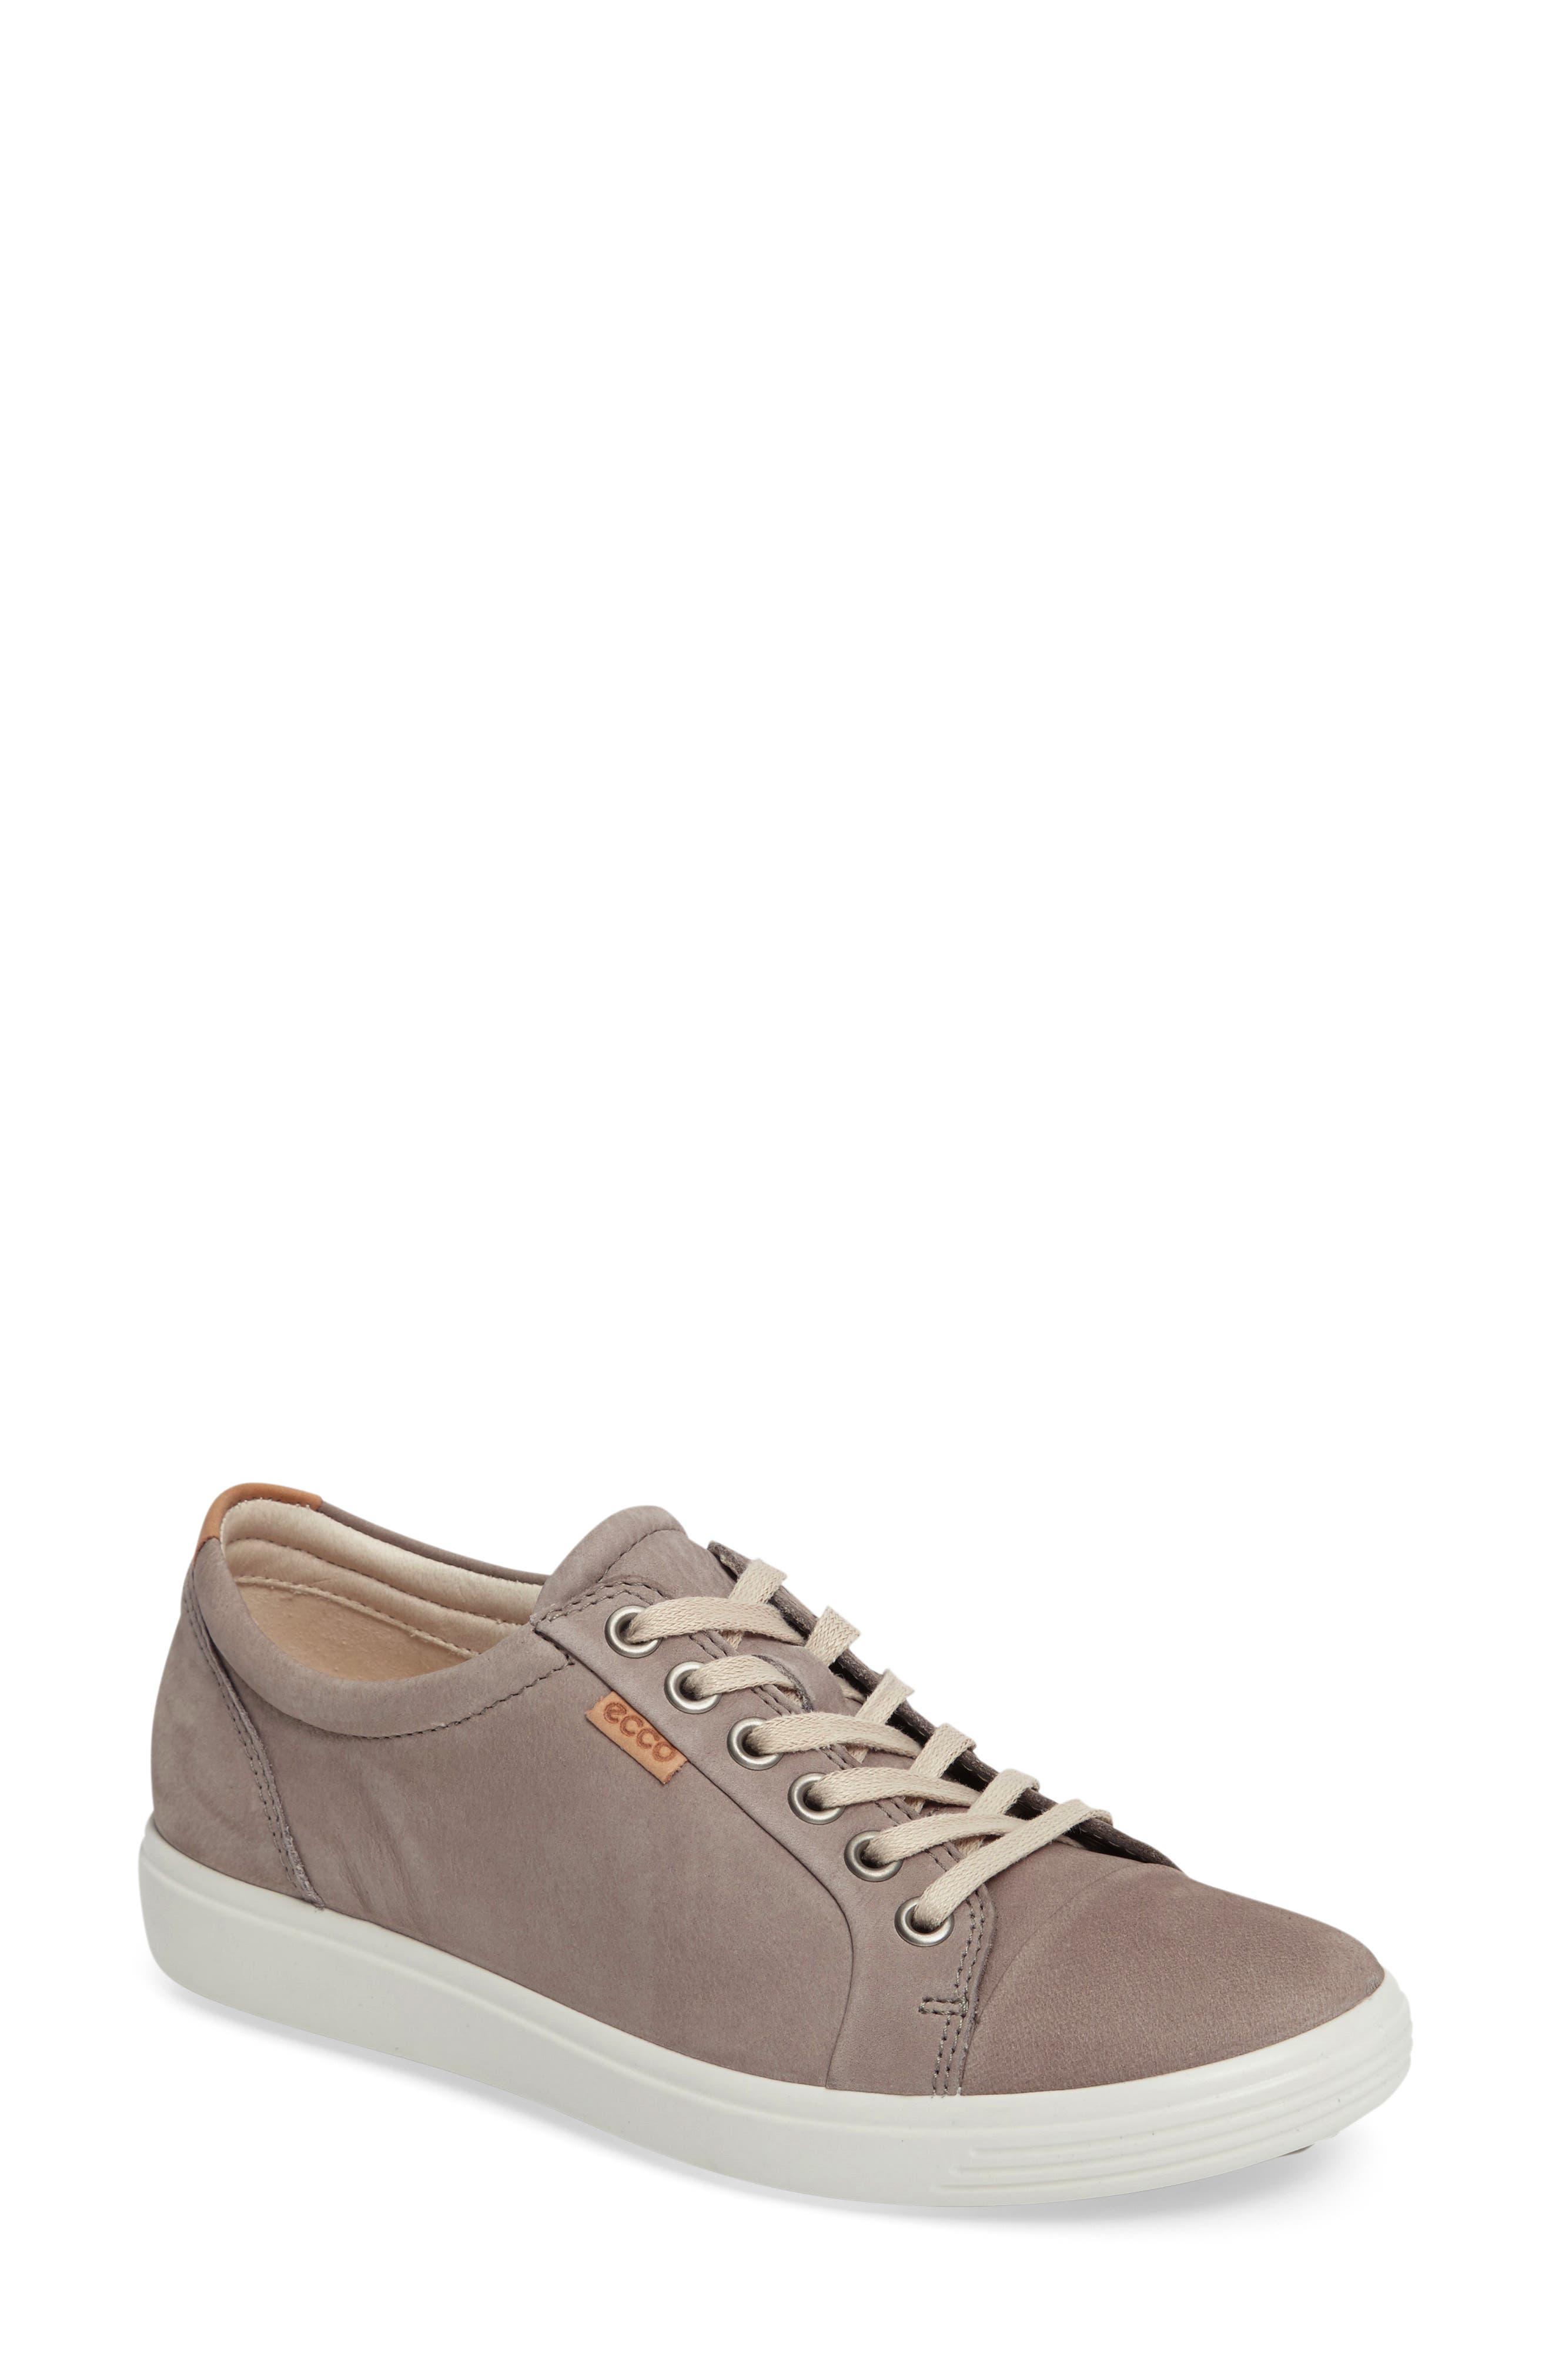 ,                             Soft 7 Sneaker,                             Main thumbnail 220, color,                             062